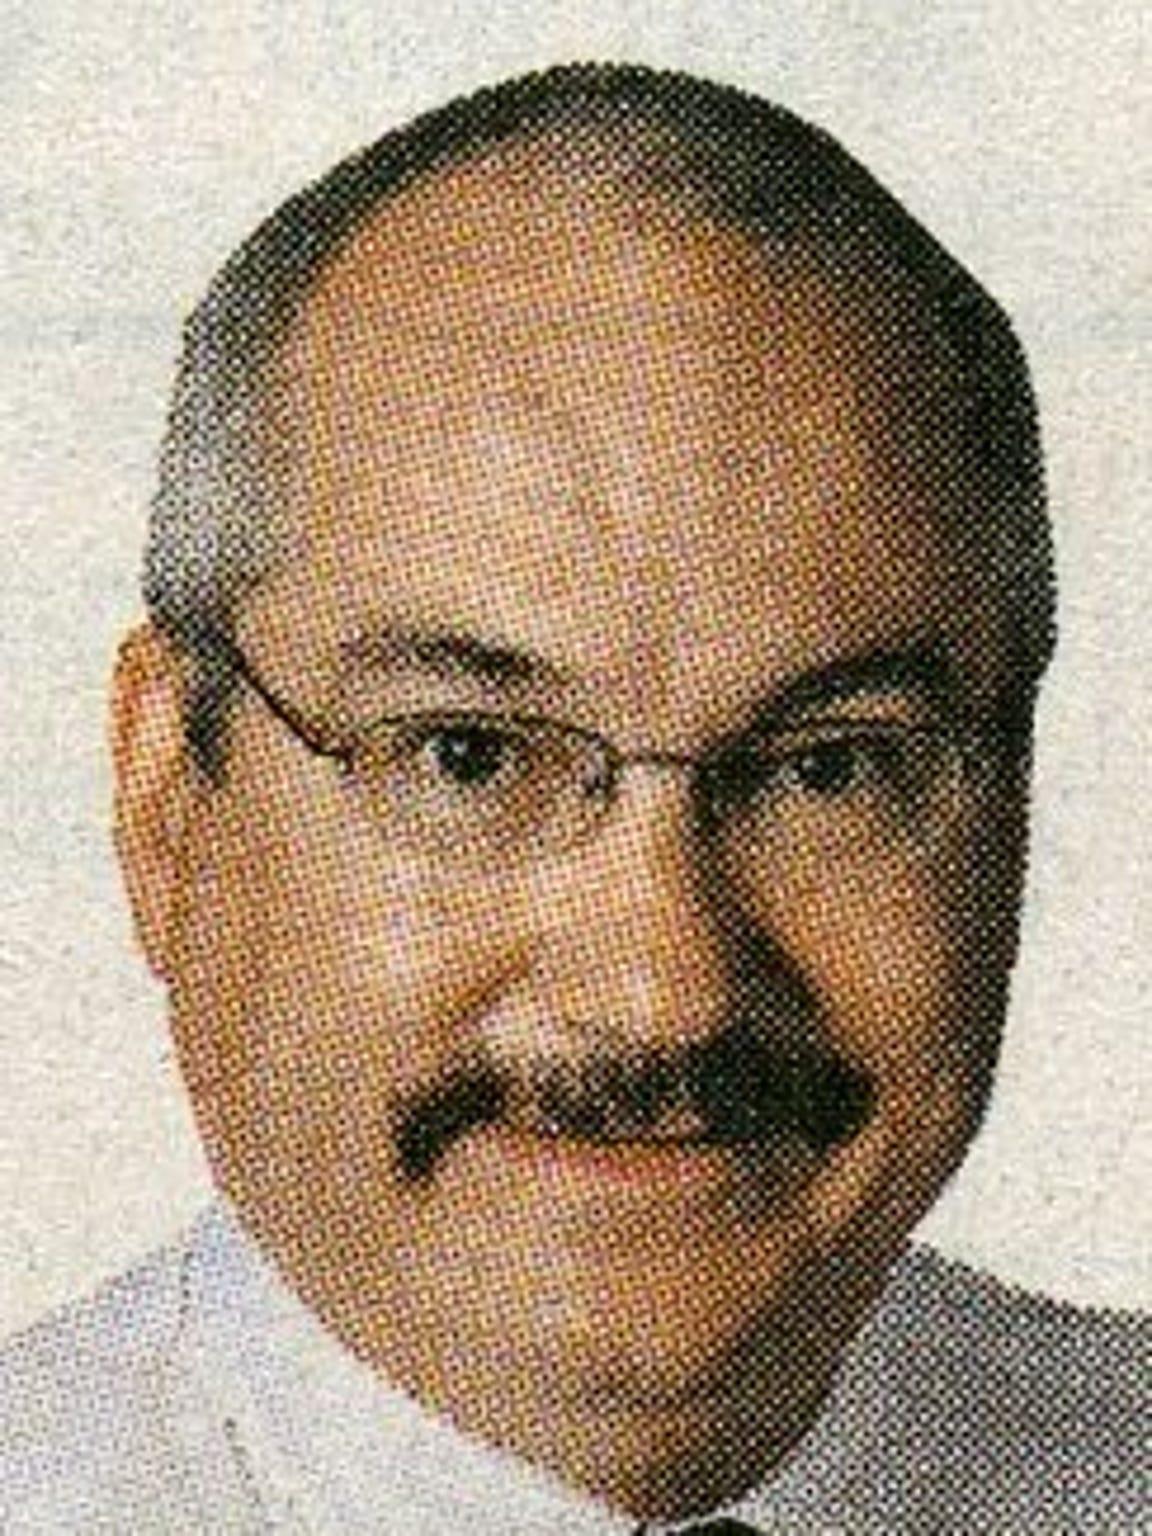 Dr. Charles Szyman